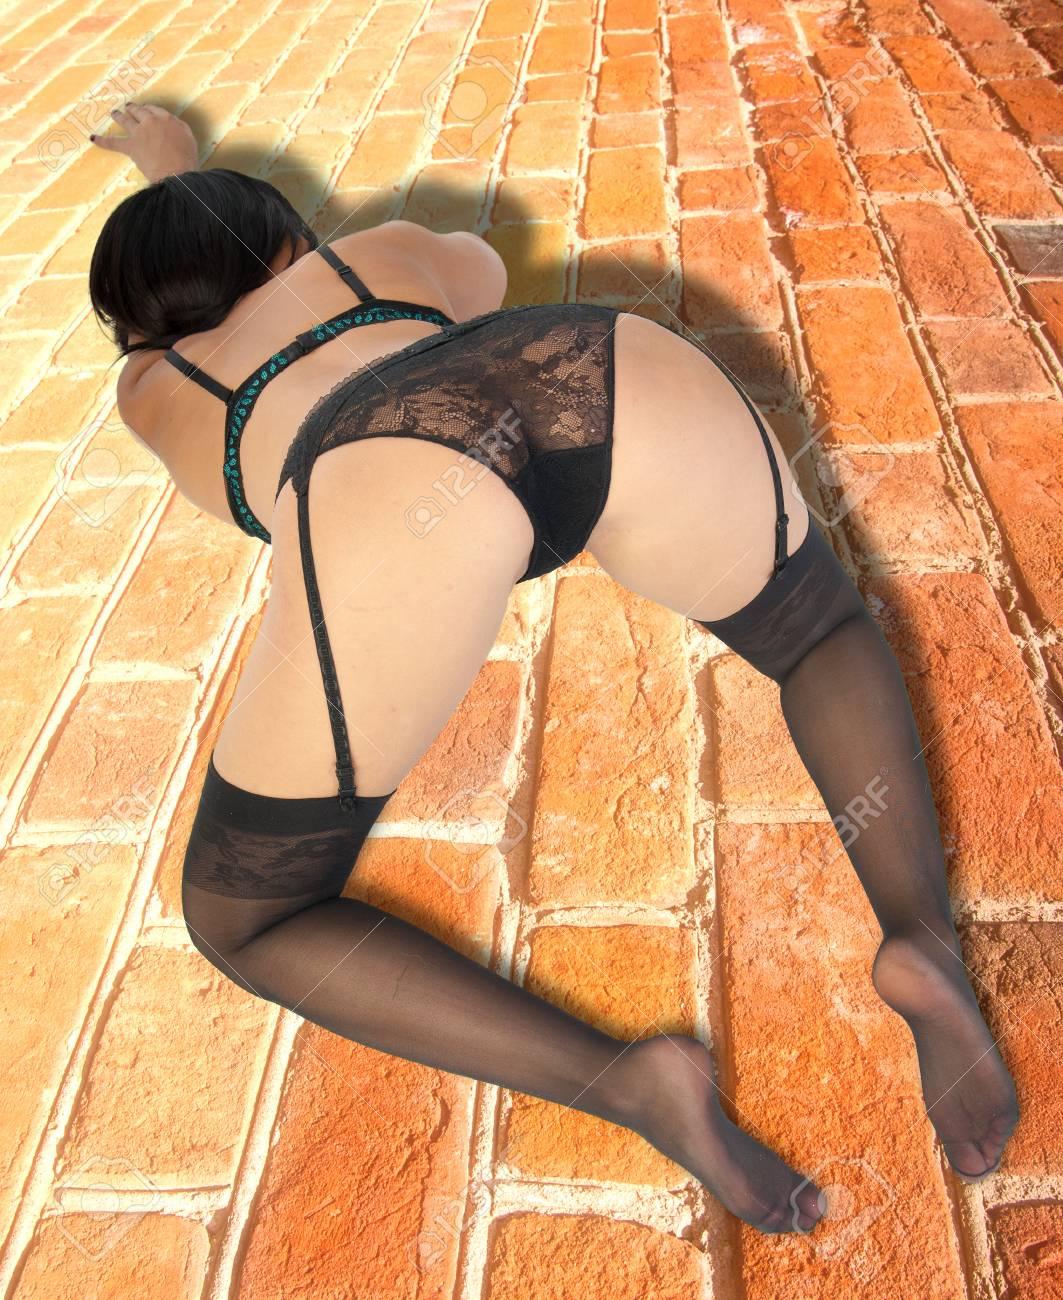 Best free sex pics